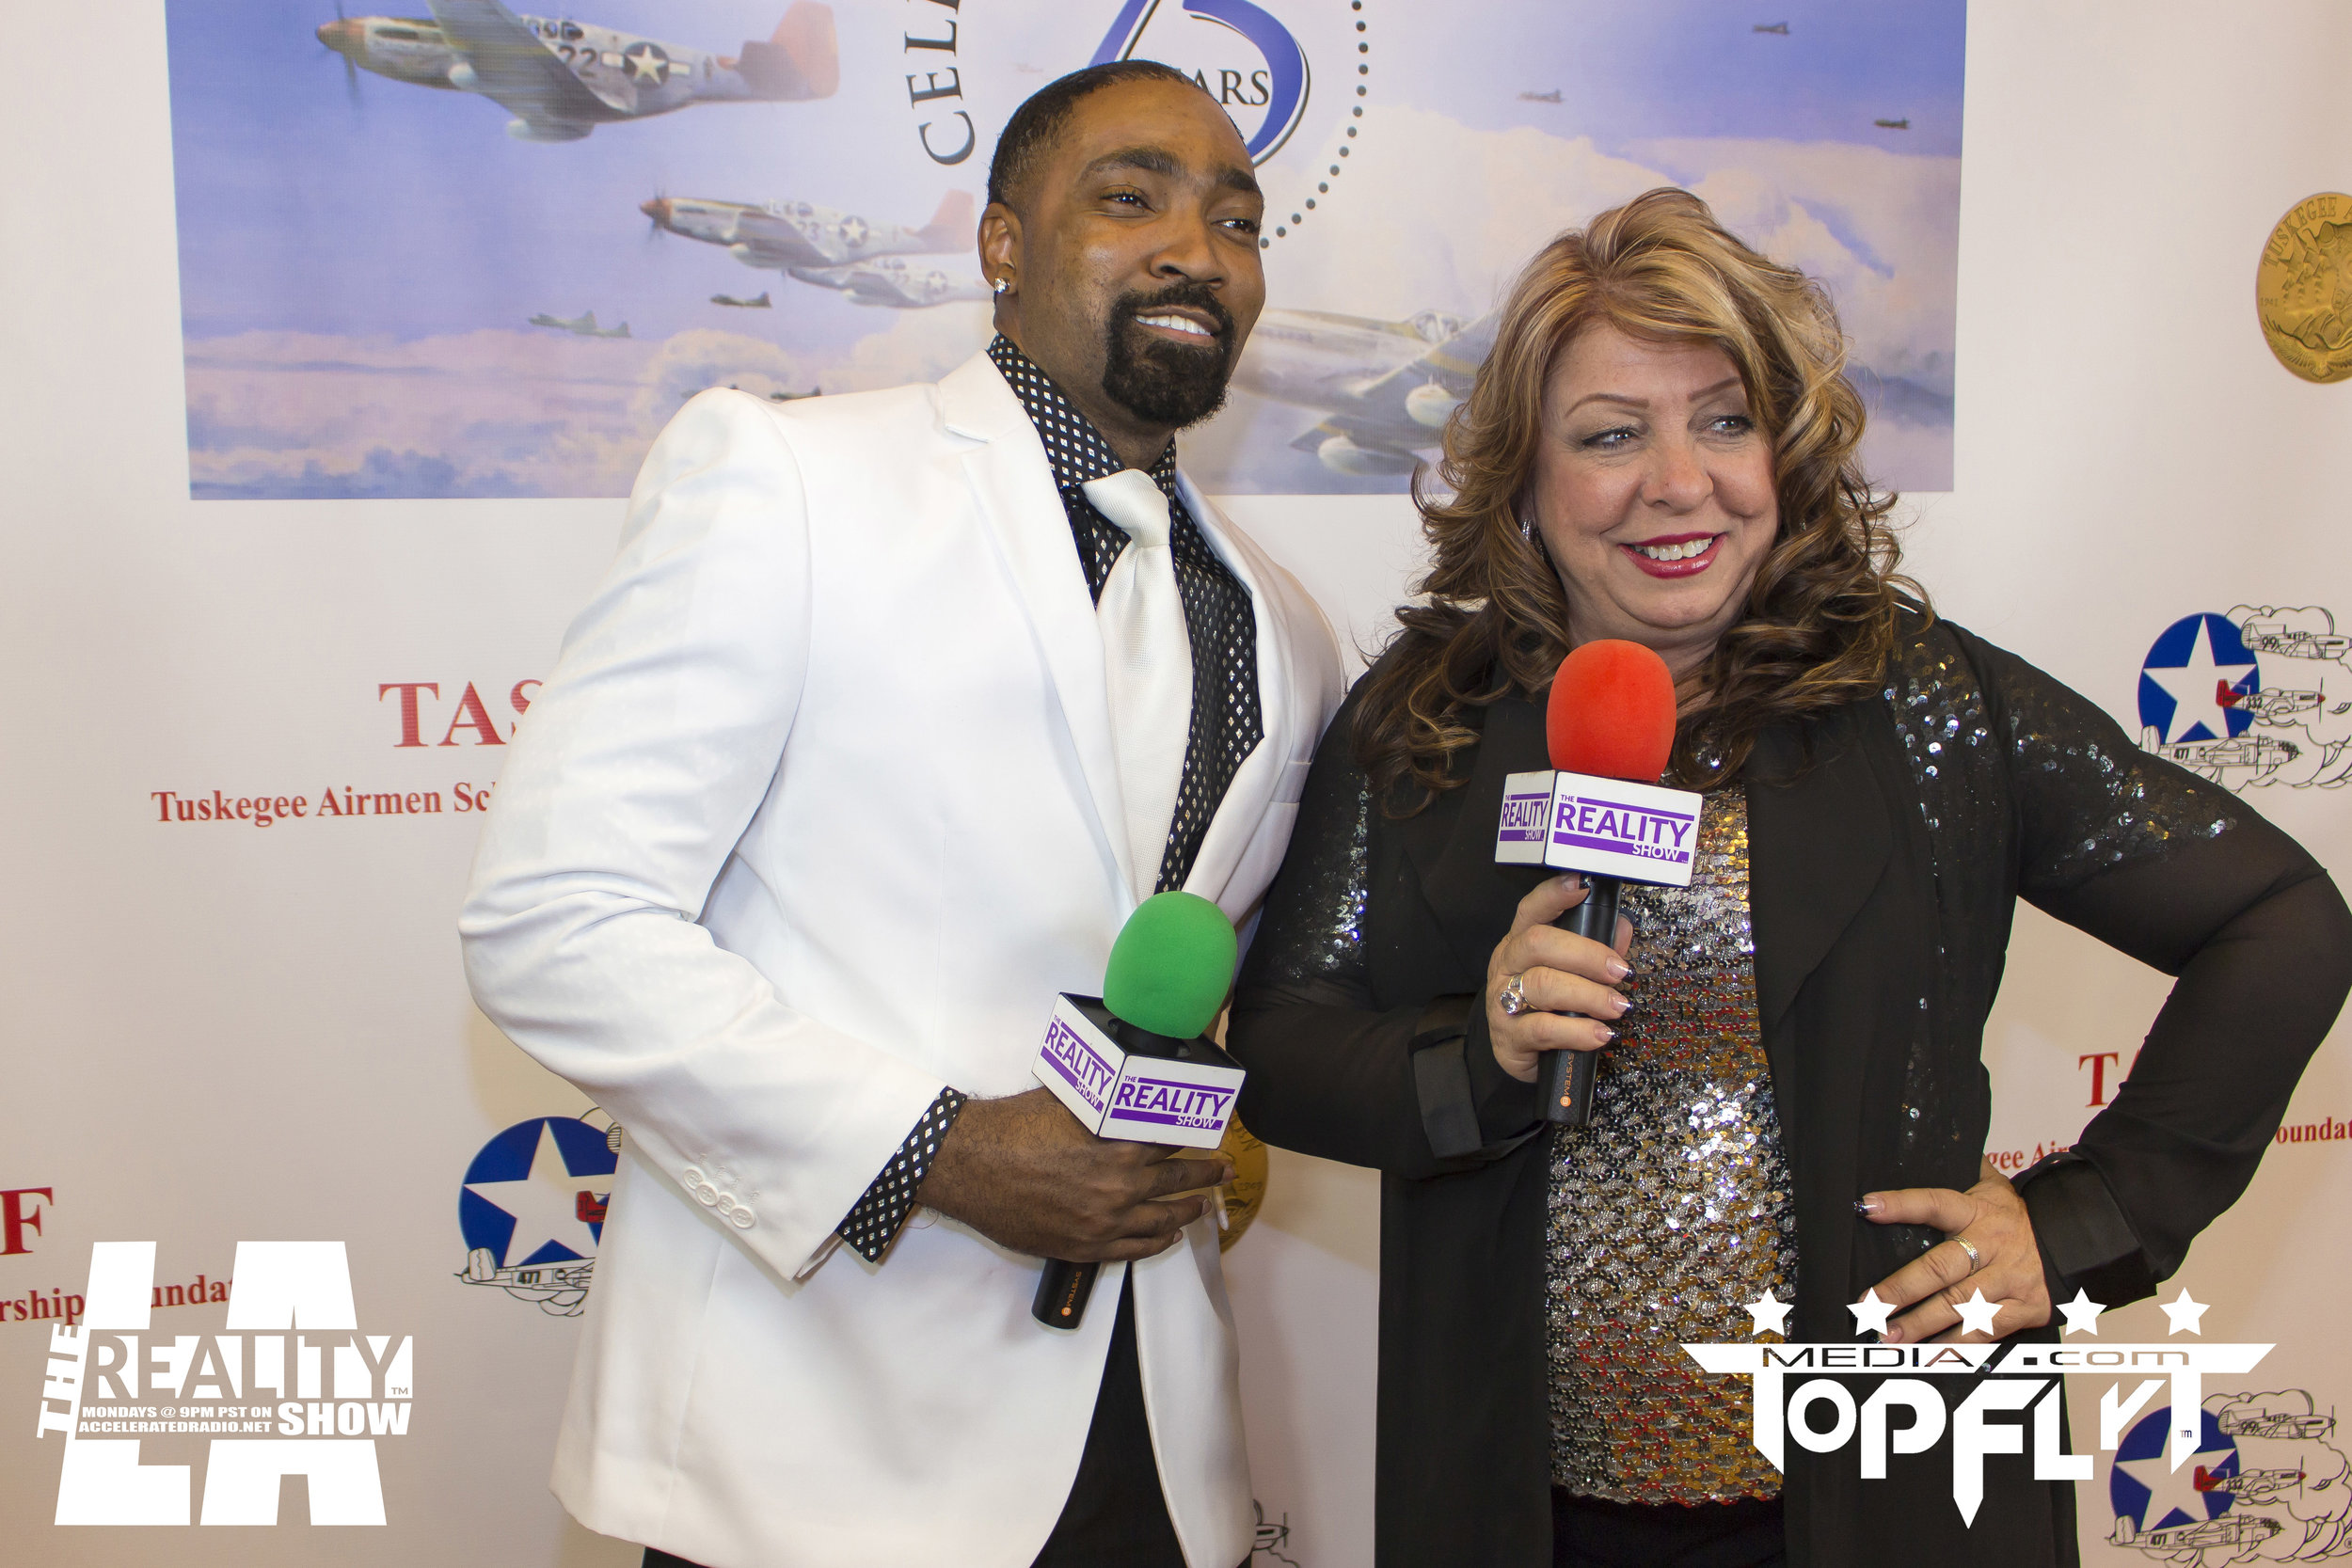 The Reality Show LA - Tuskegee Airmen 75th Anniversary VIP Reception_66.jpg